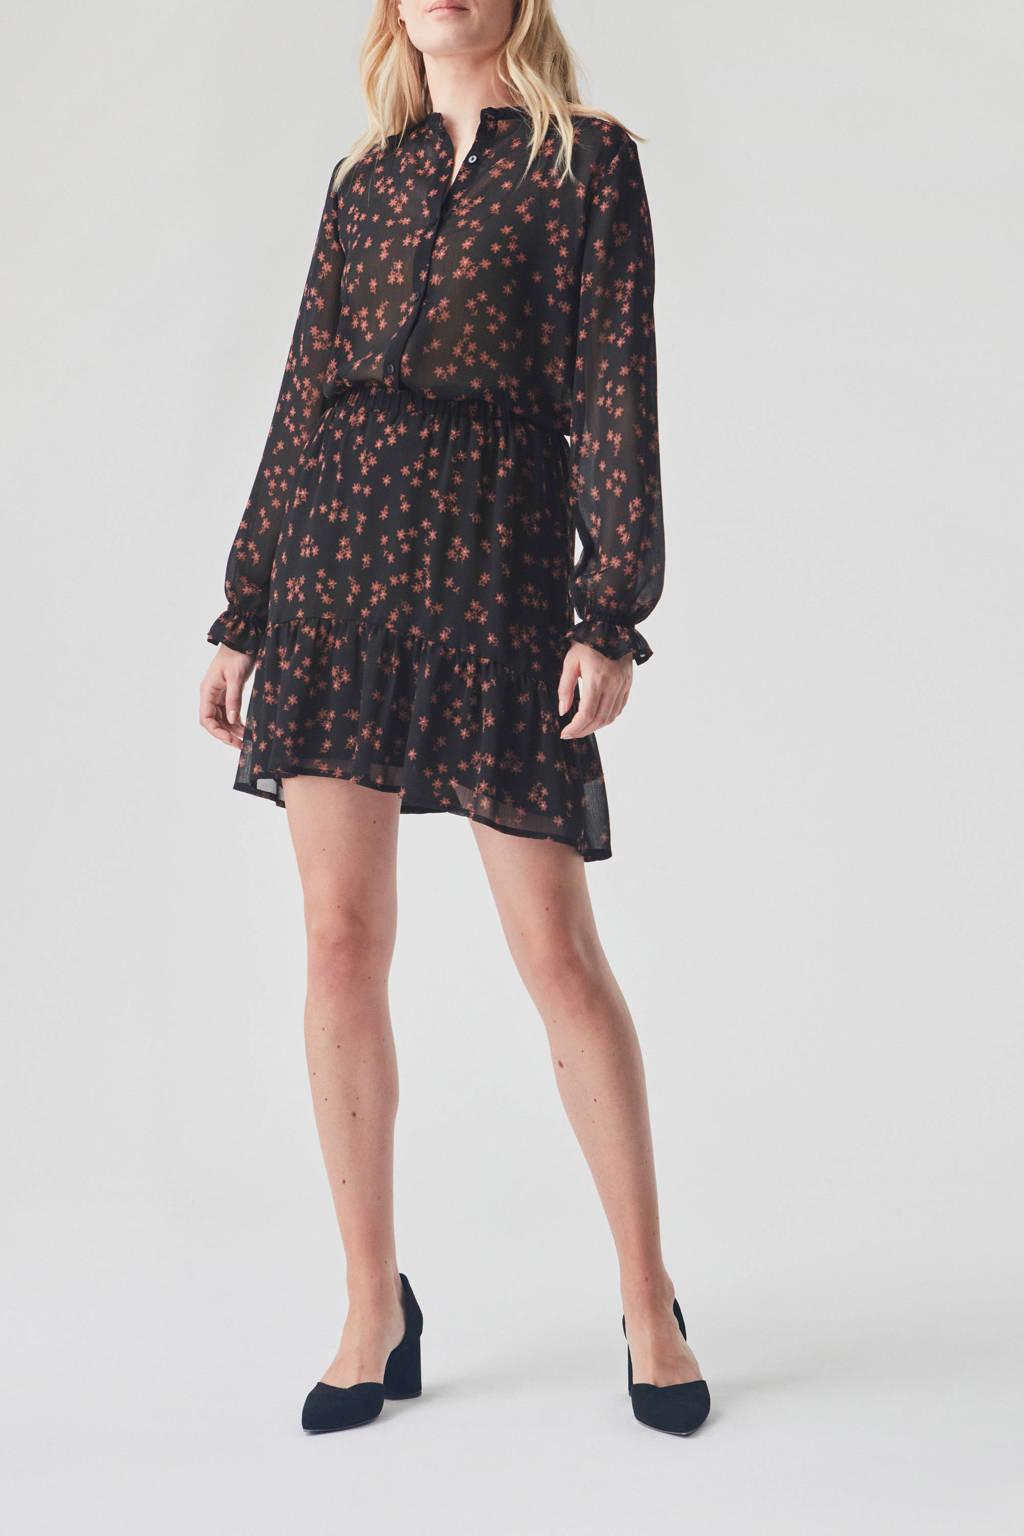 Modström gebloemde semi-transparante rok Erica van gerecycled polyester zwart/ bruin